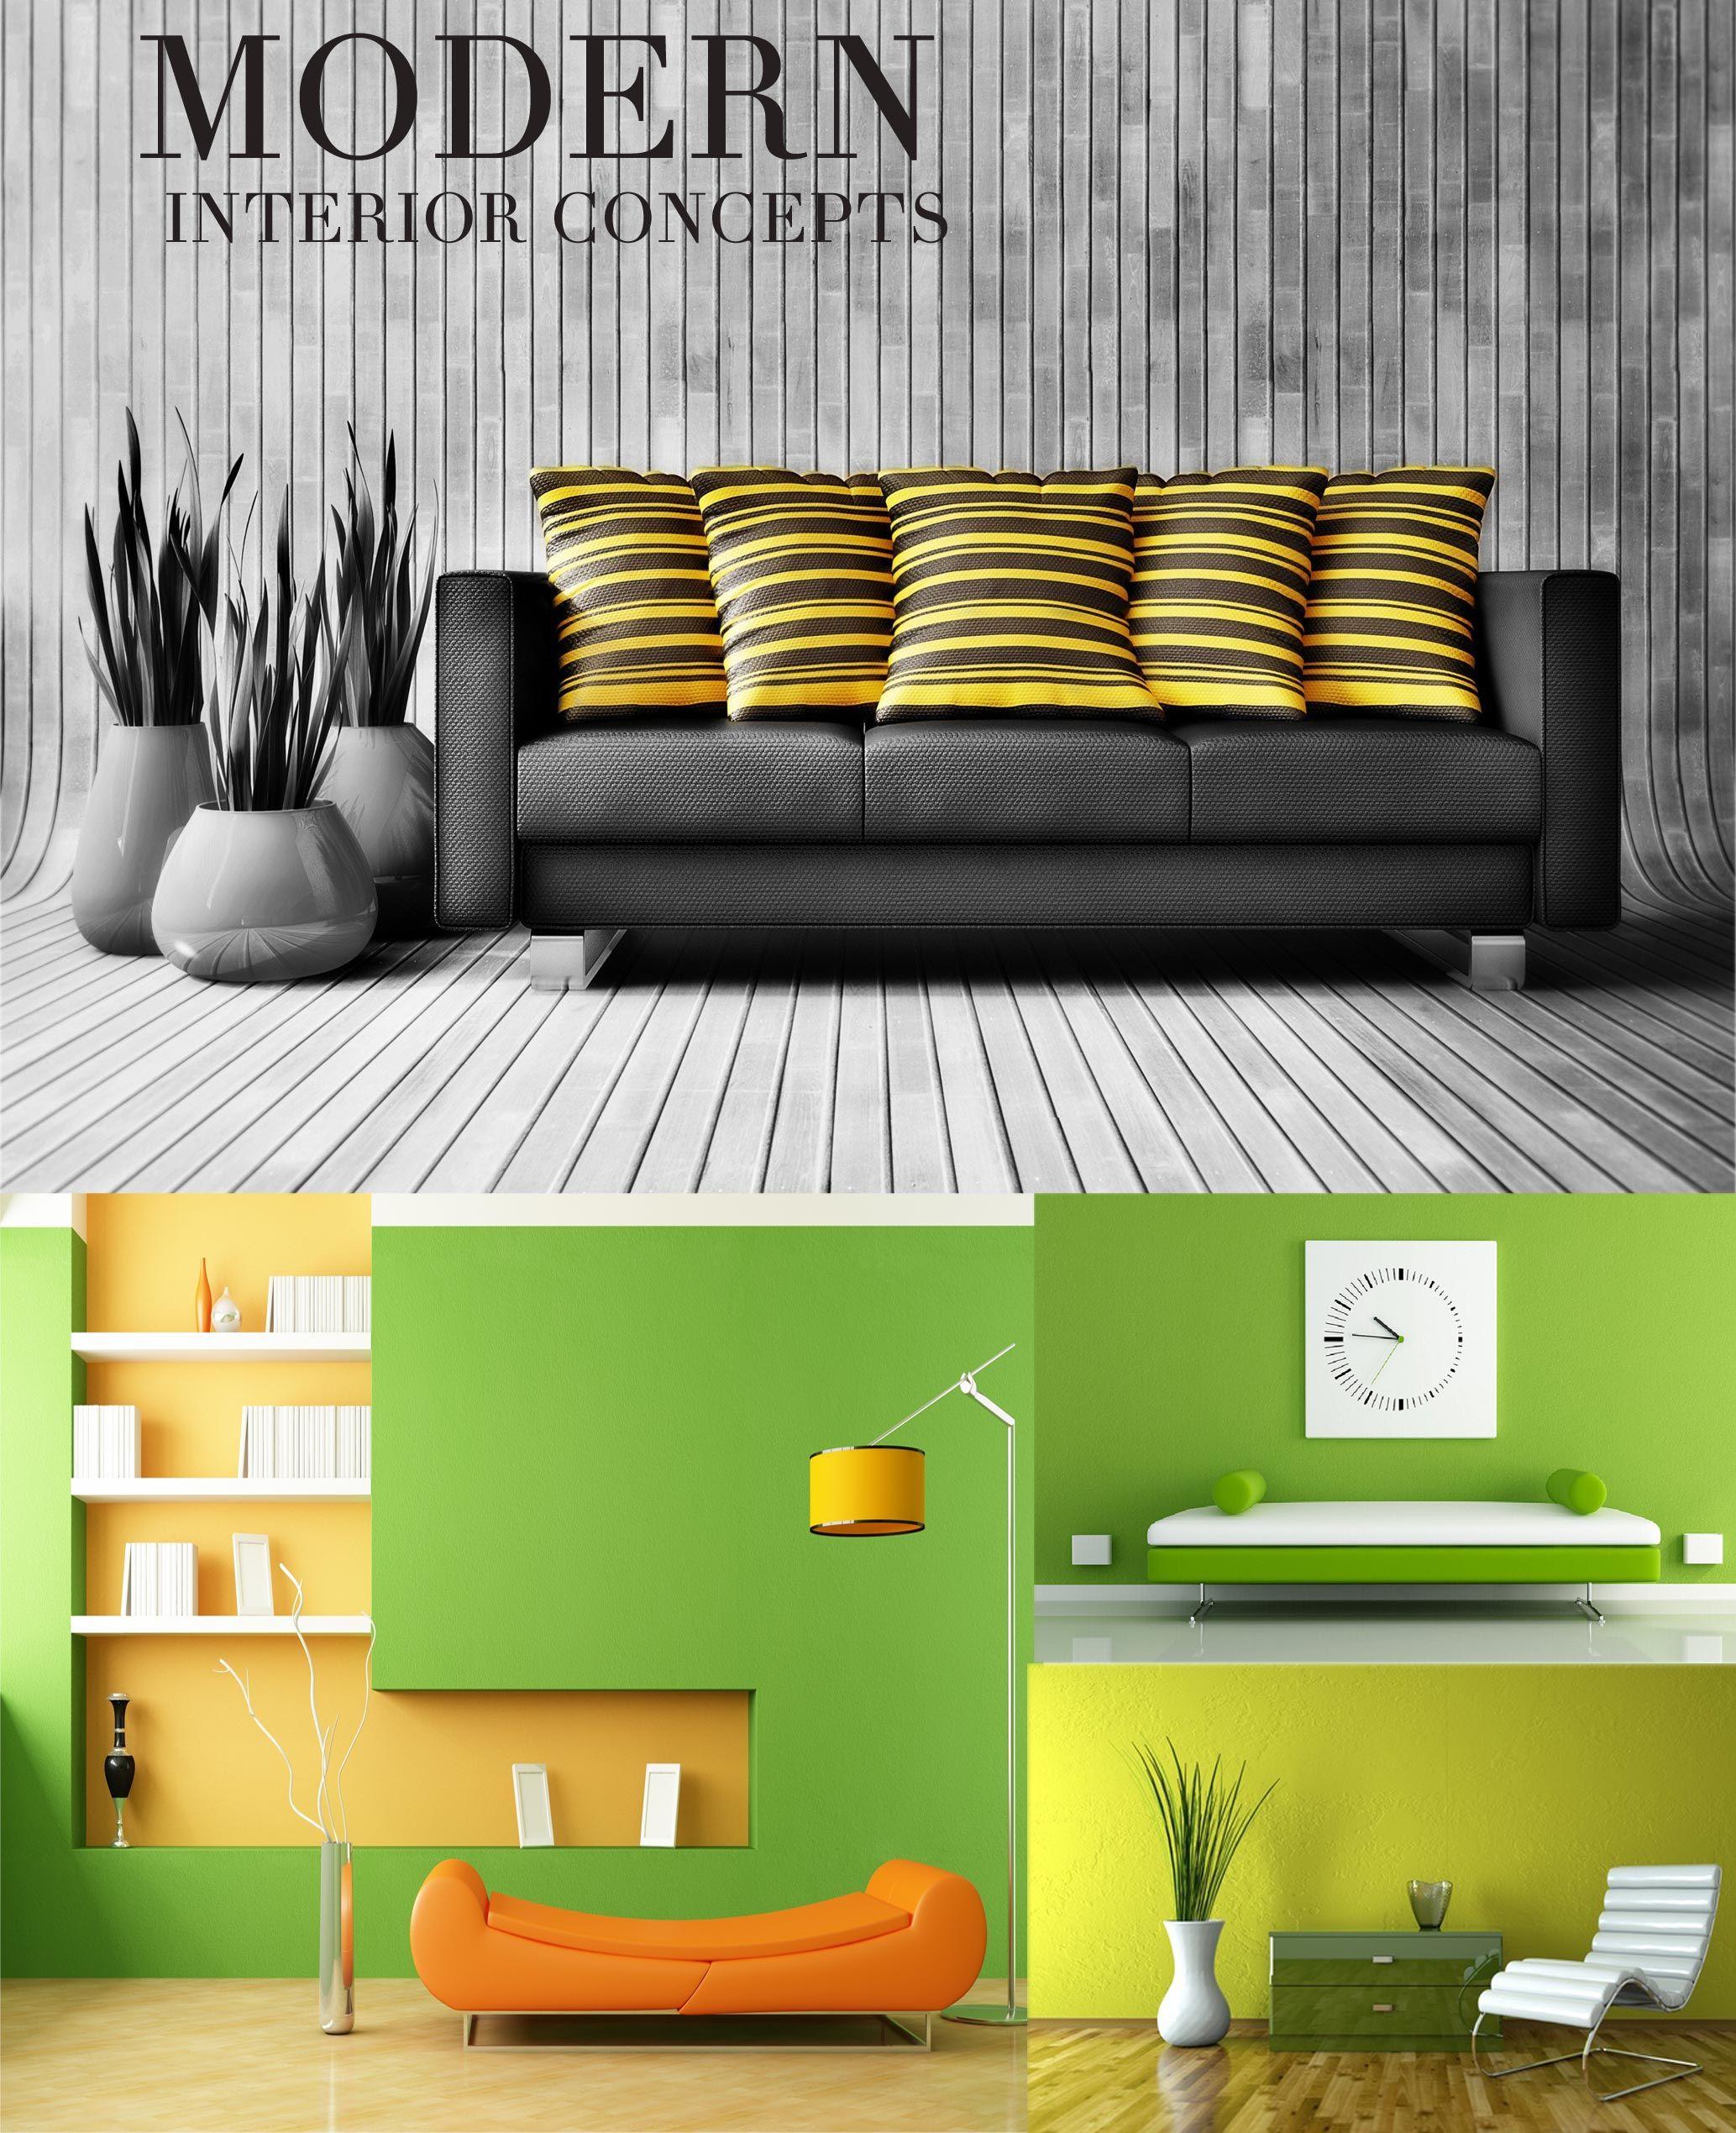 Modern Interior Concepts Magazine Ad Moderninteriorconcepts